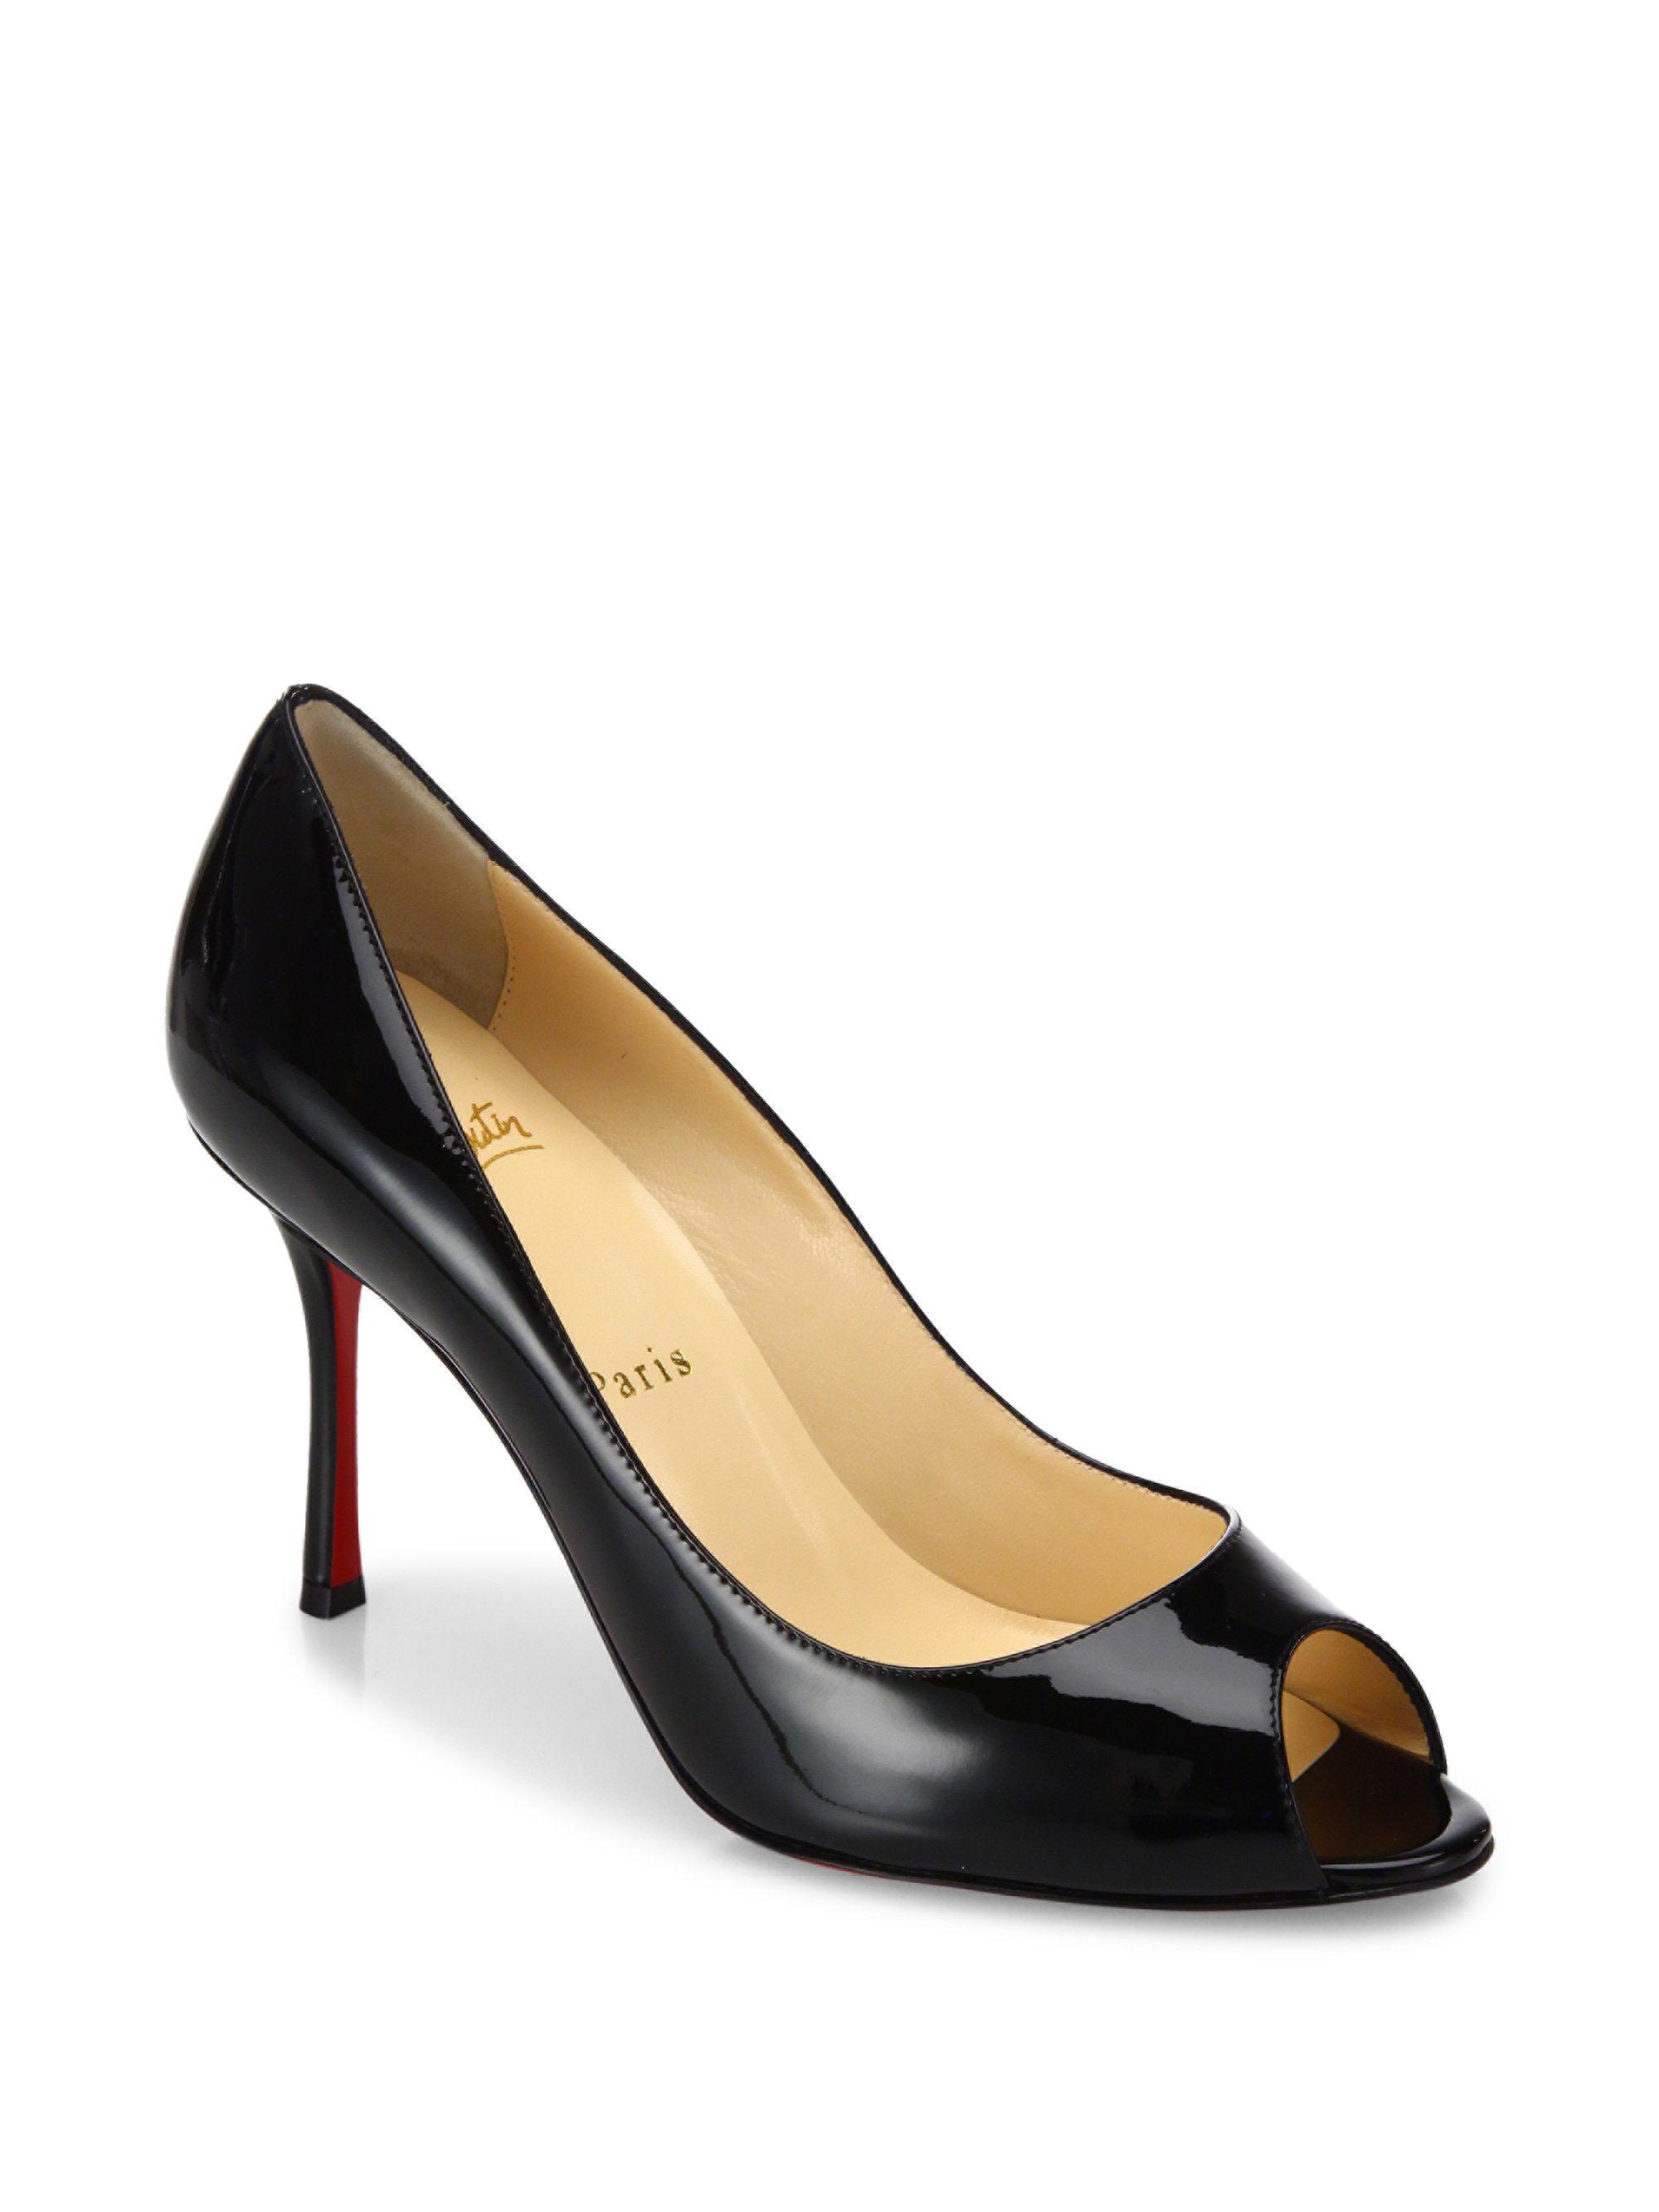 ec711c3066 Christian Louboutin Yootish 85 Patent Leather Peep Toe Pumps in ...